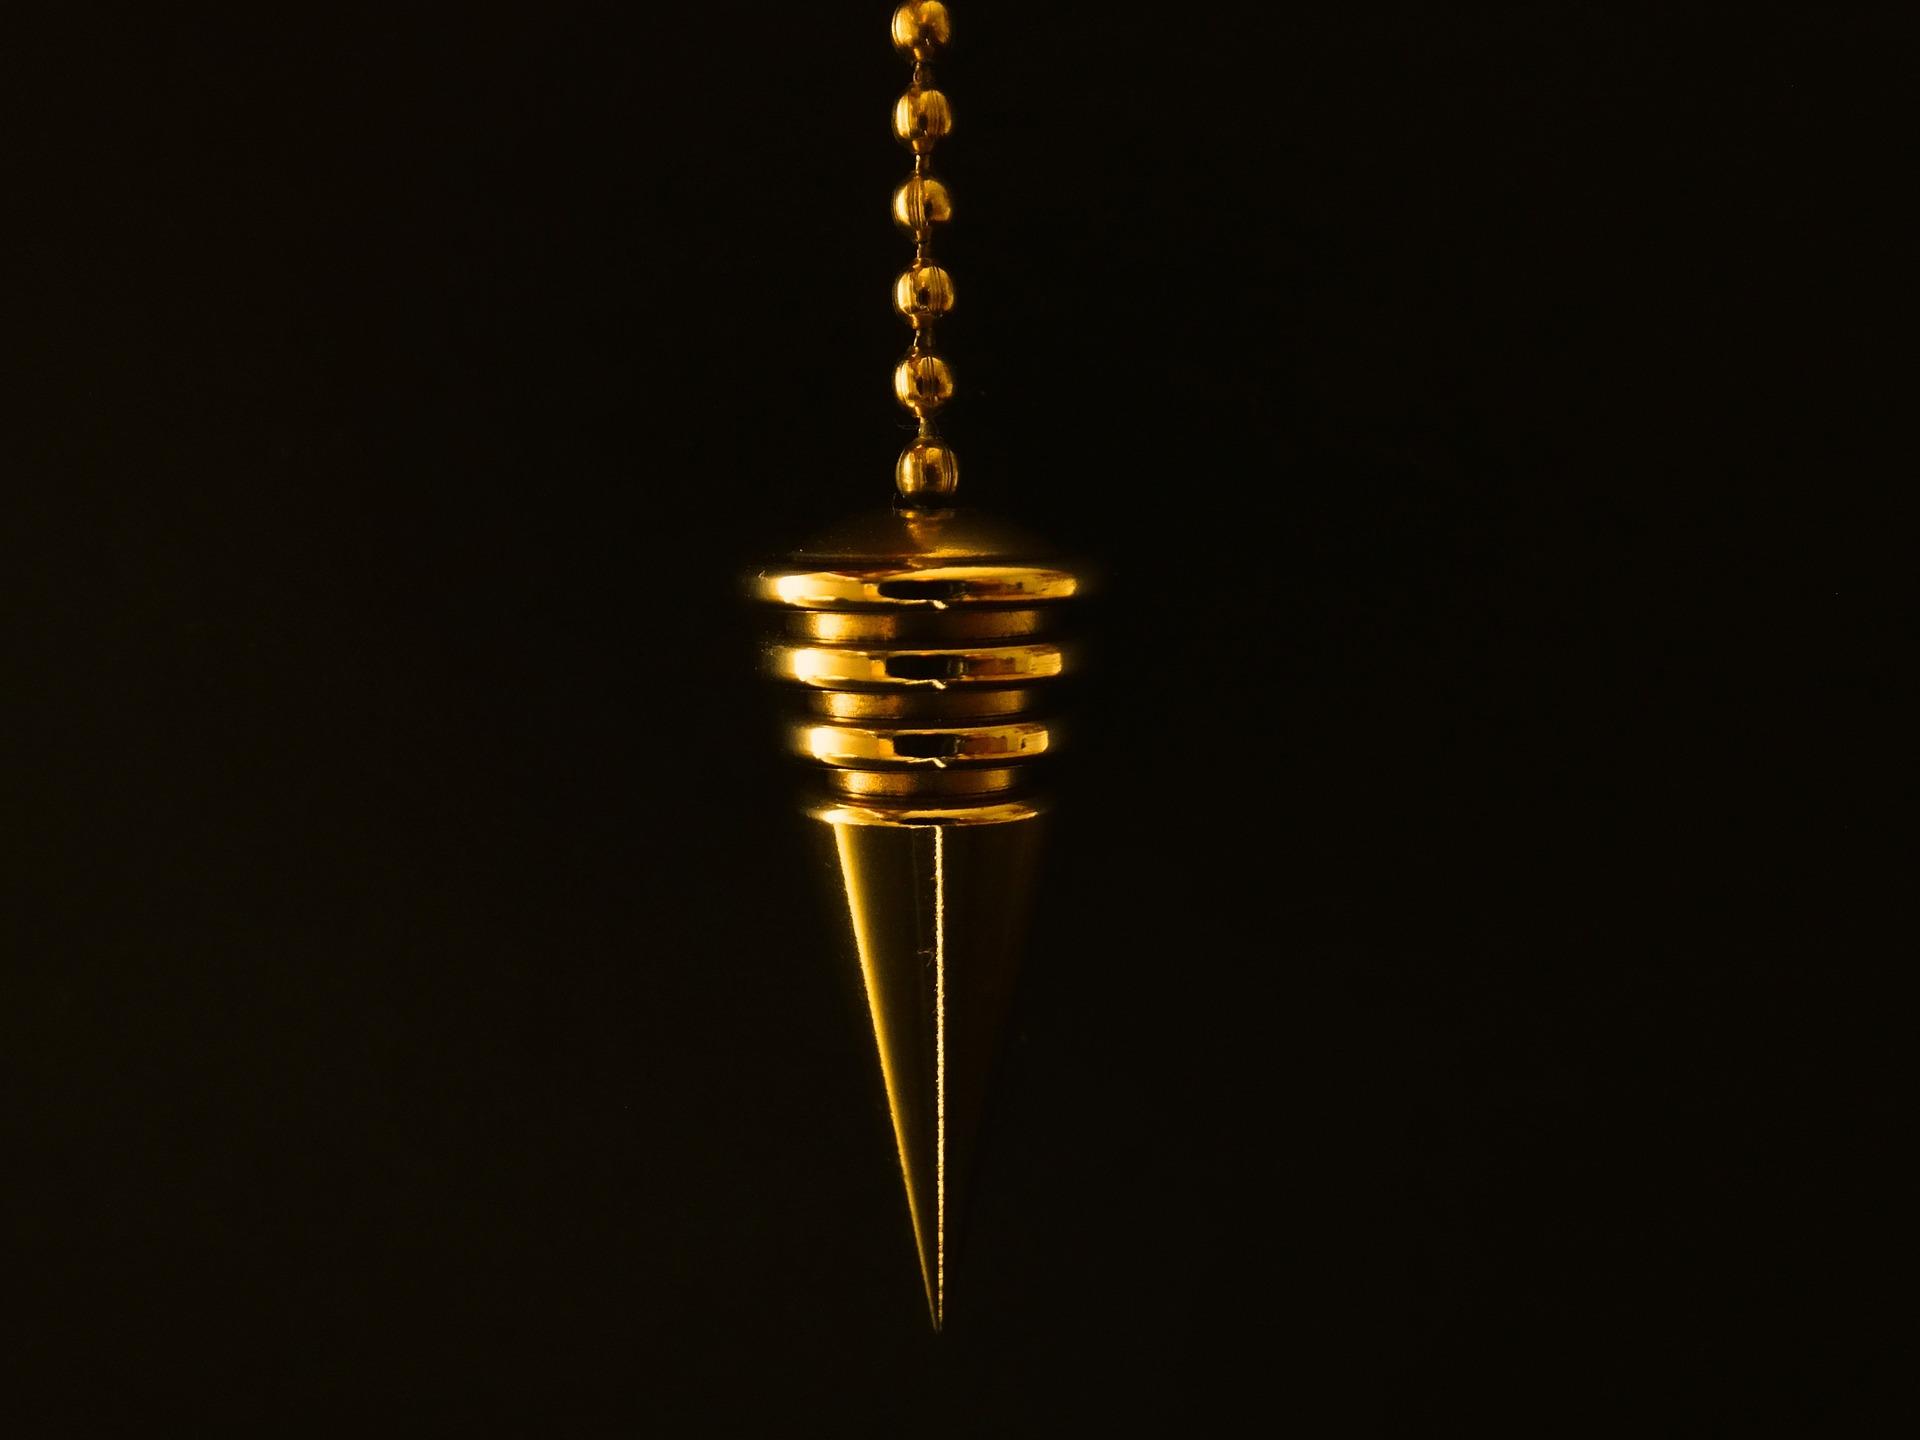 Gold Replating